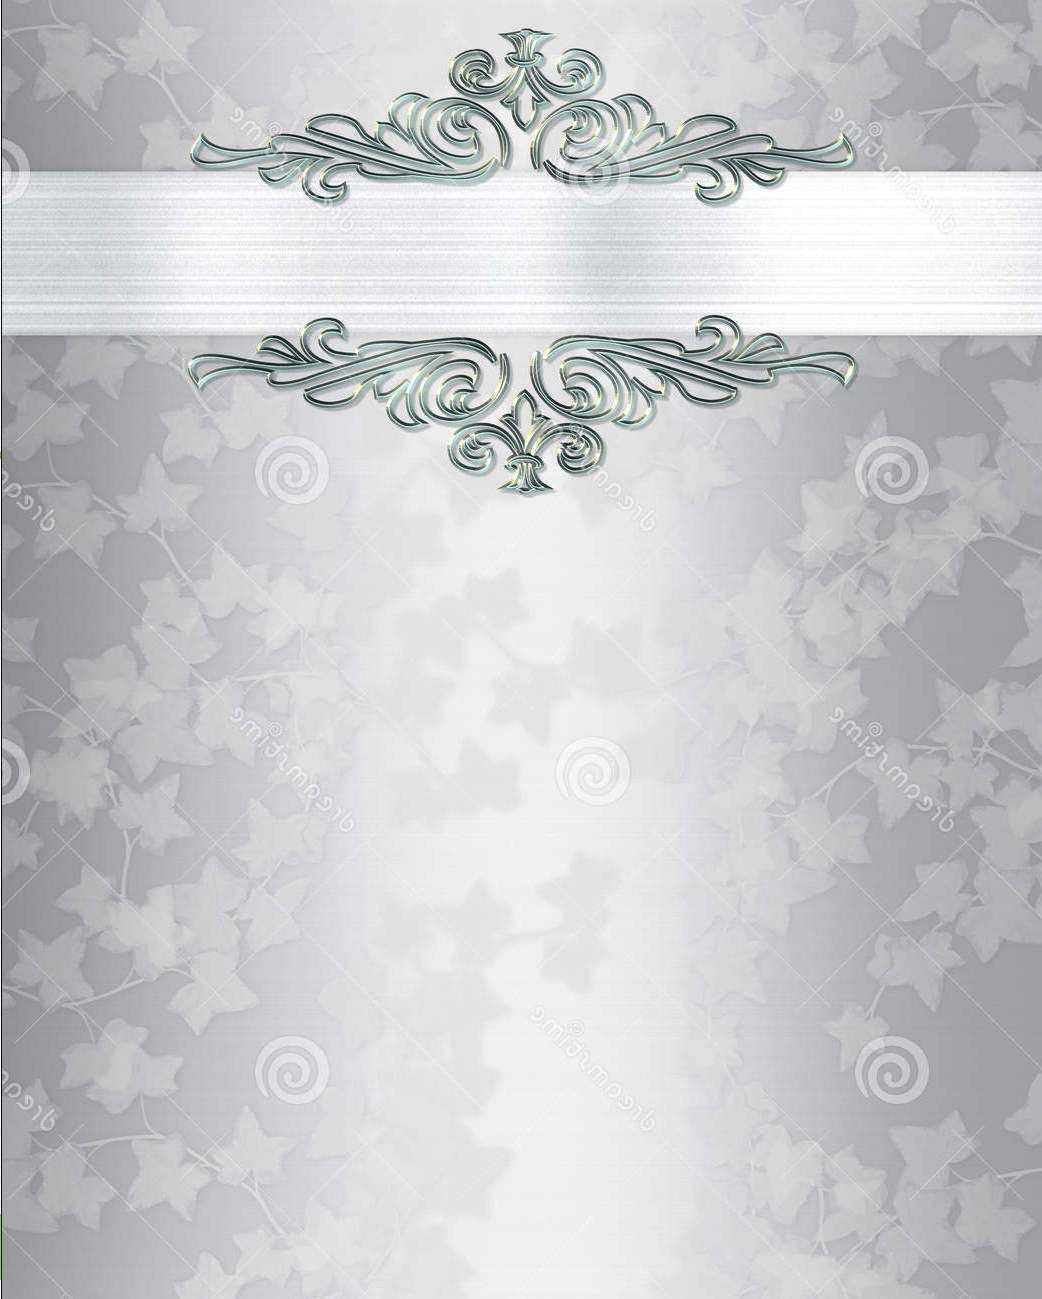 Blank Wedding Invitations Marina Gallery Fine Art Silver Wedding Invitations Wedding Invitation Background Blank Wedding Invitations